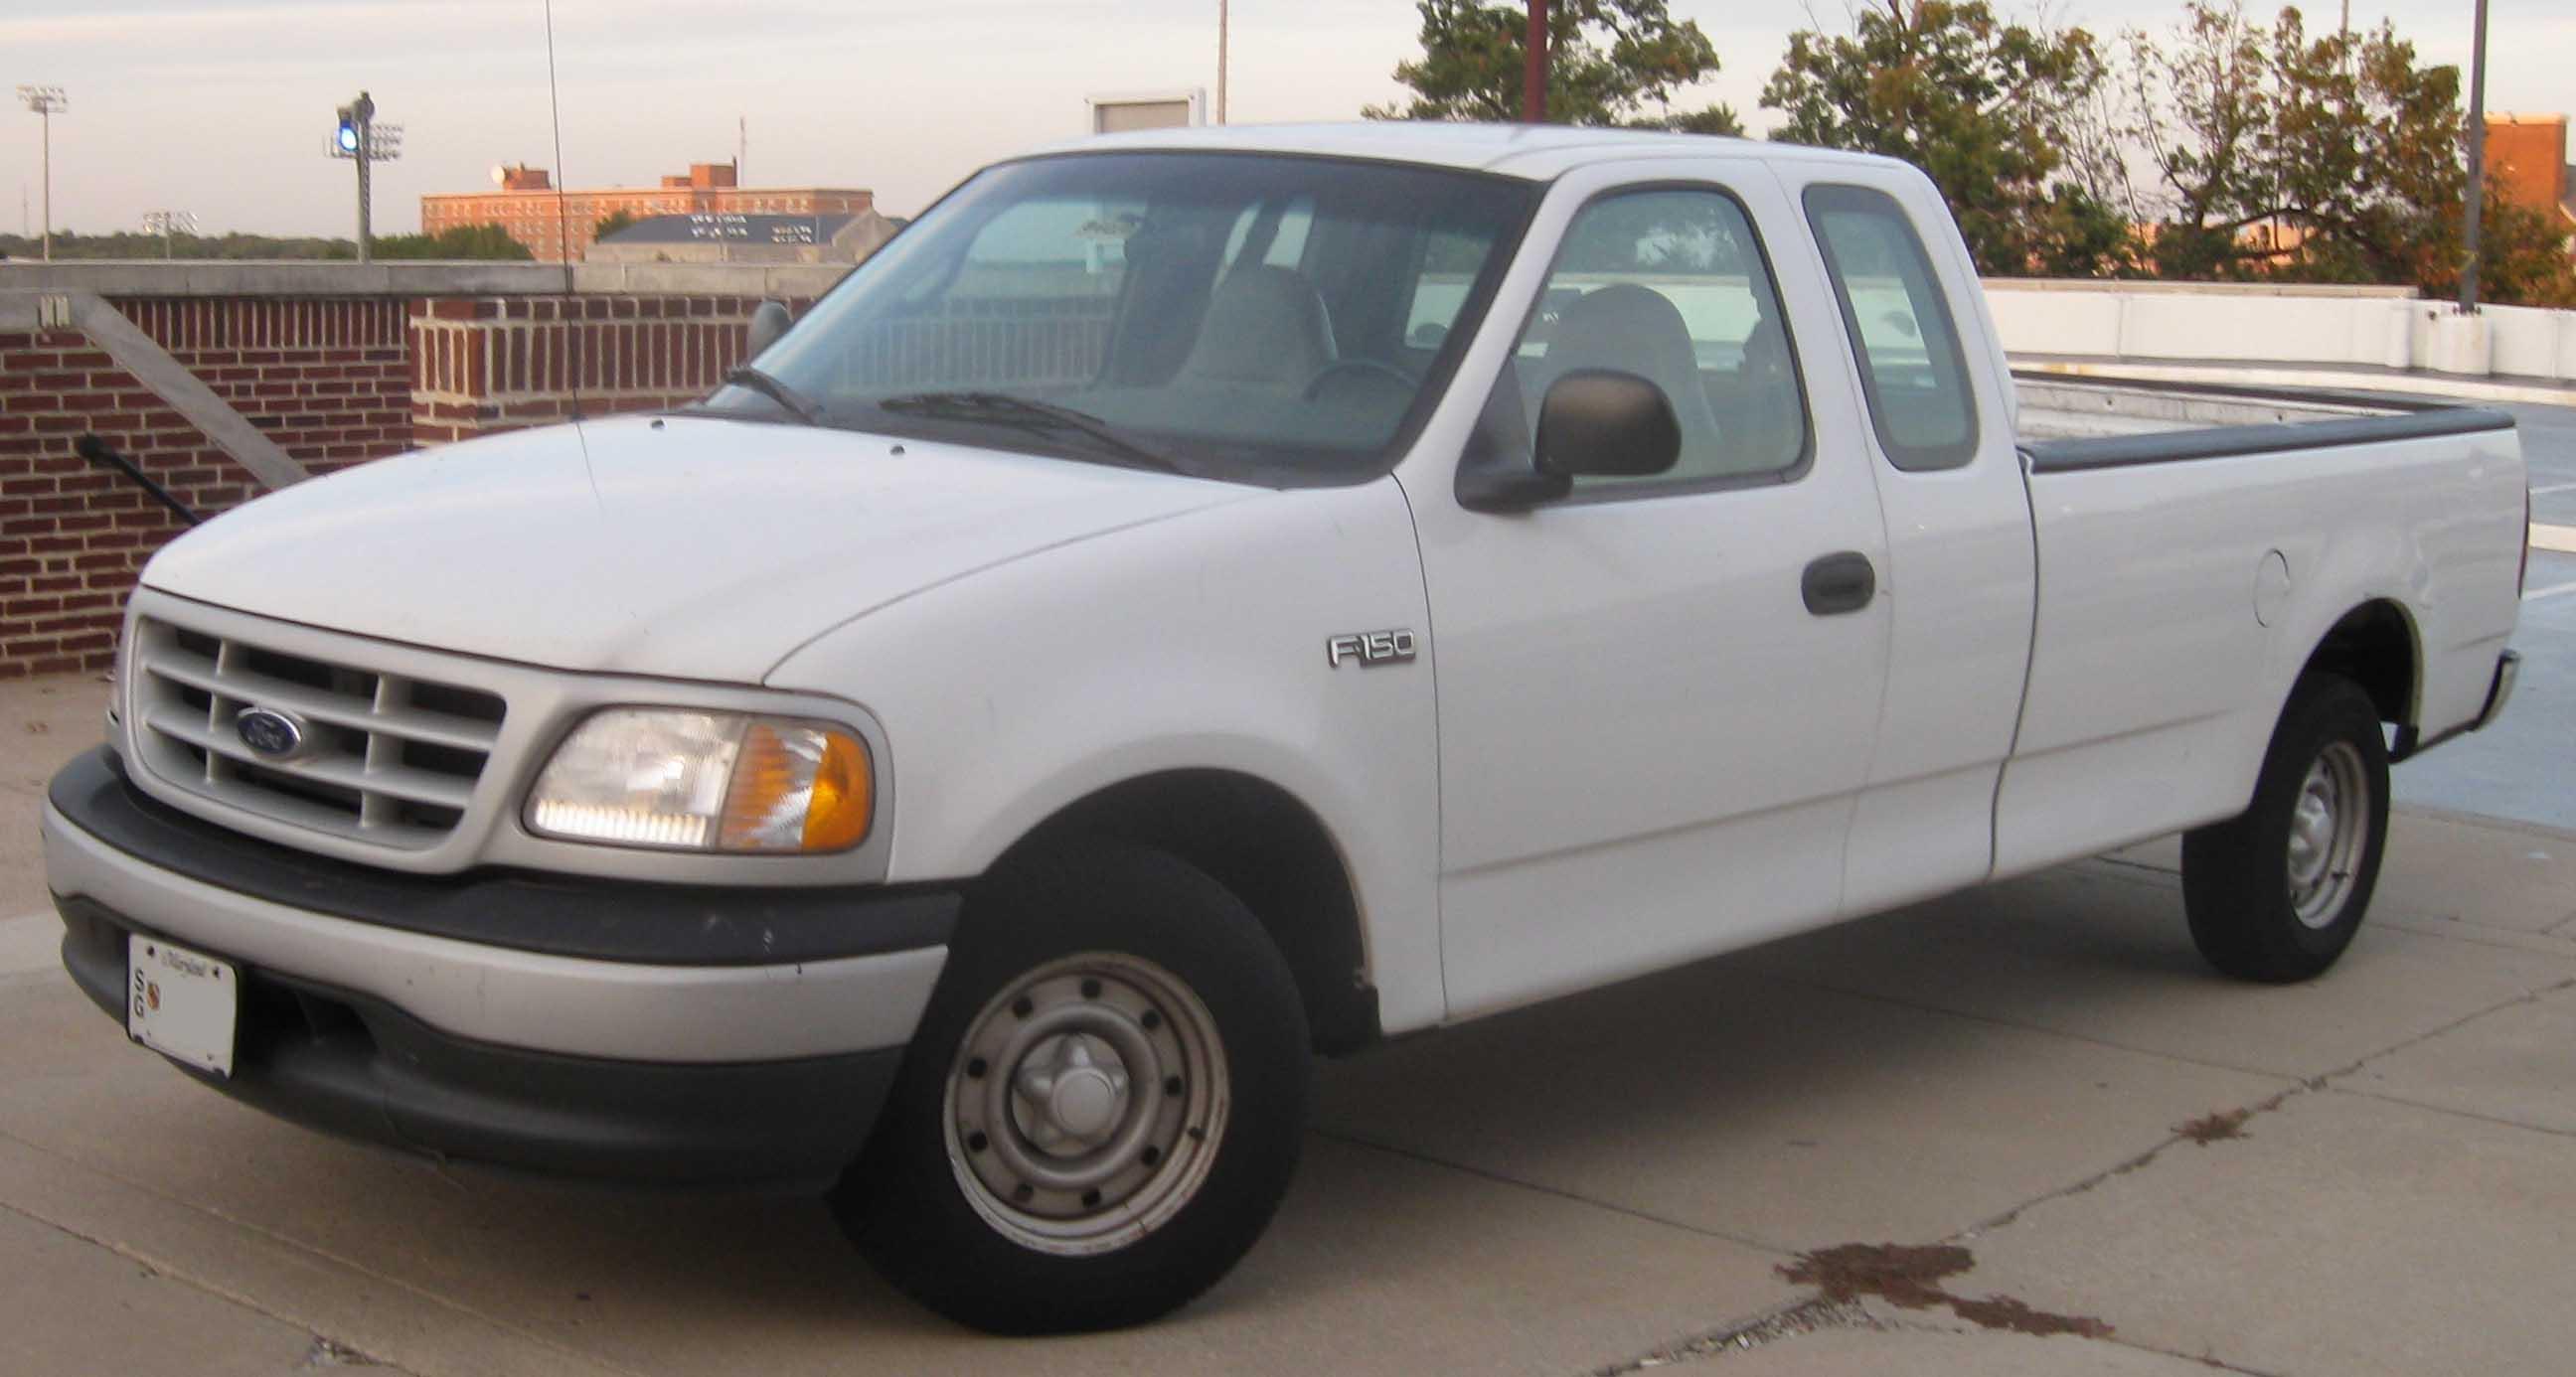 Ford 4 2 v6 long block for Ford f150 4 6 motor for sale